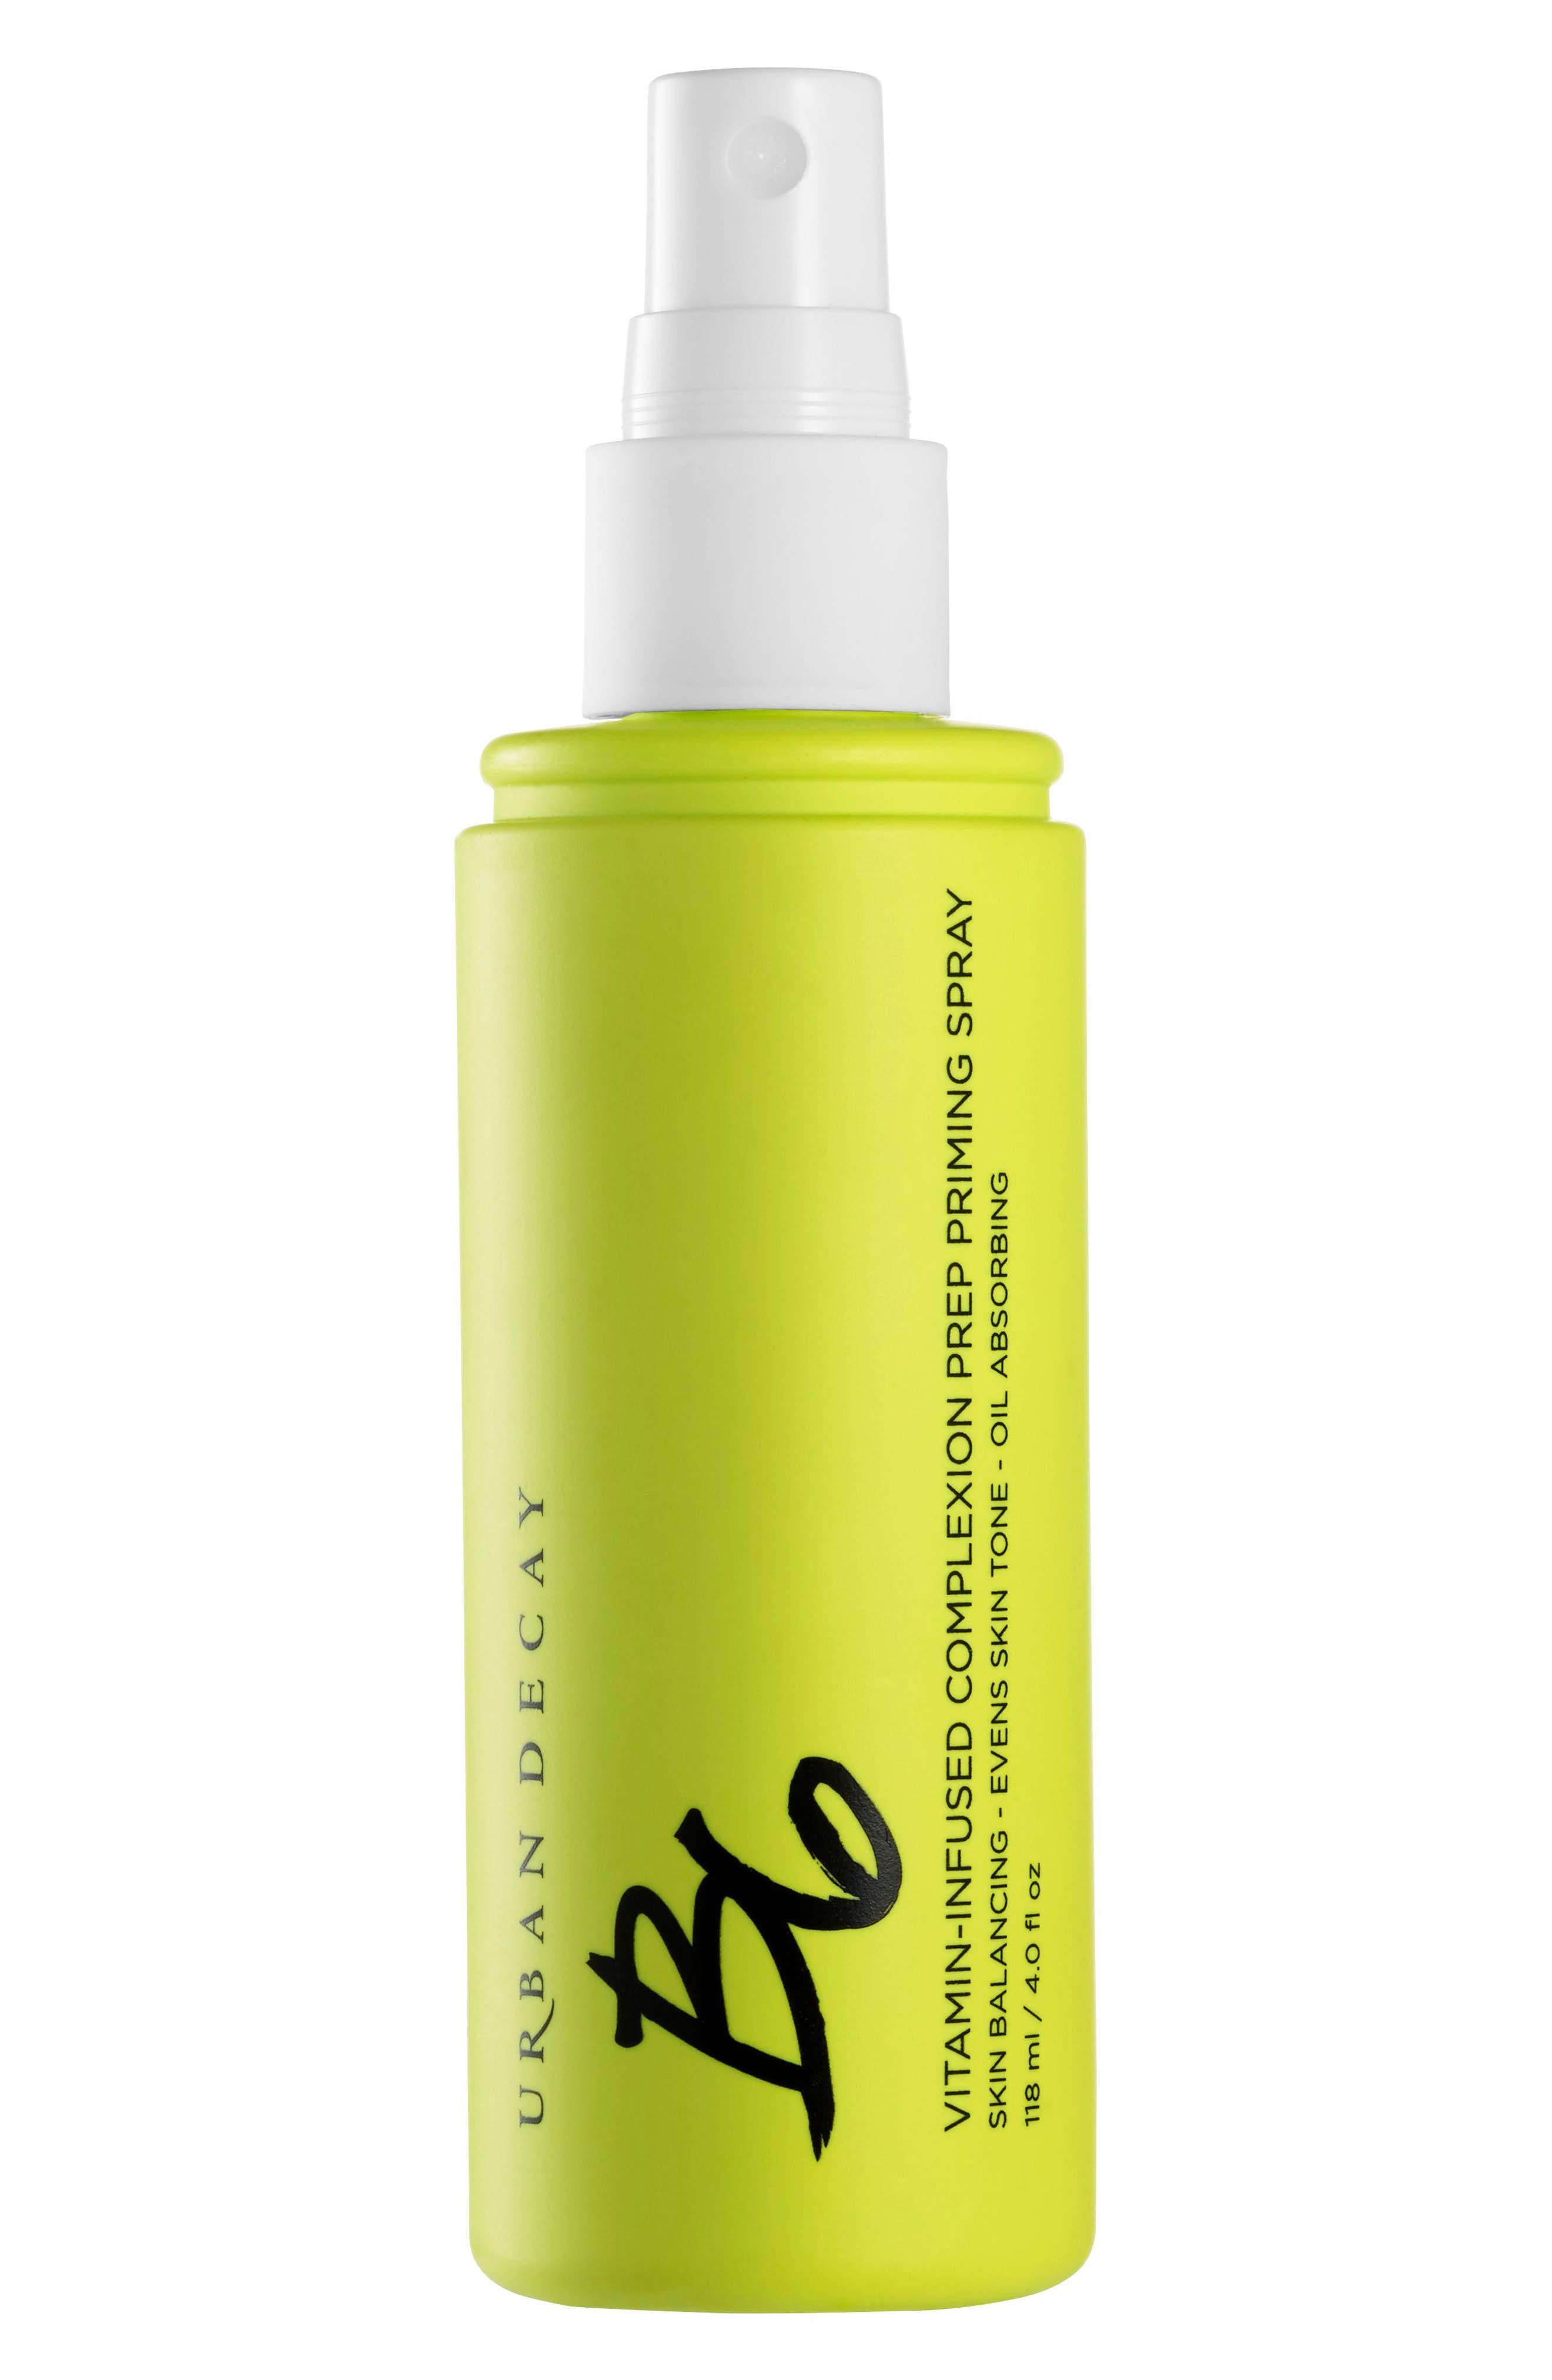 B6 Vitamin-Infused Complexion Prep Priming Spray,                             Alternate thumbnail 2, color,                             NO COLOR